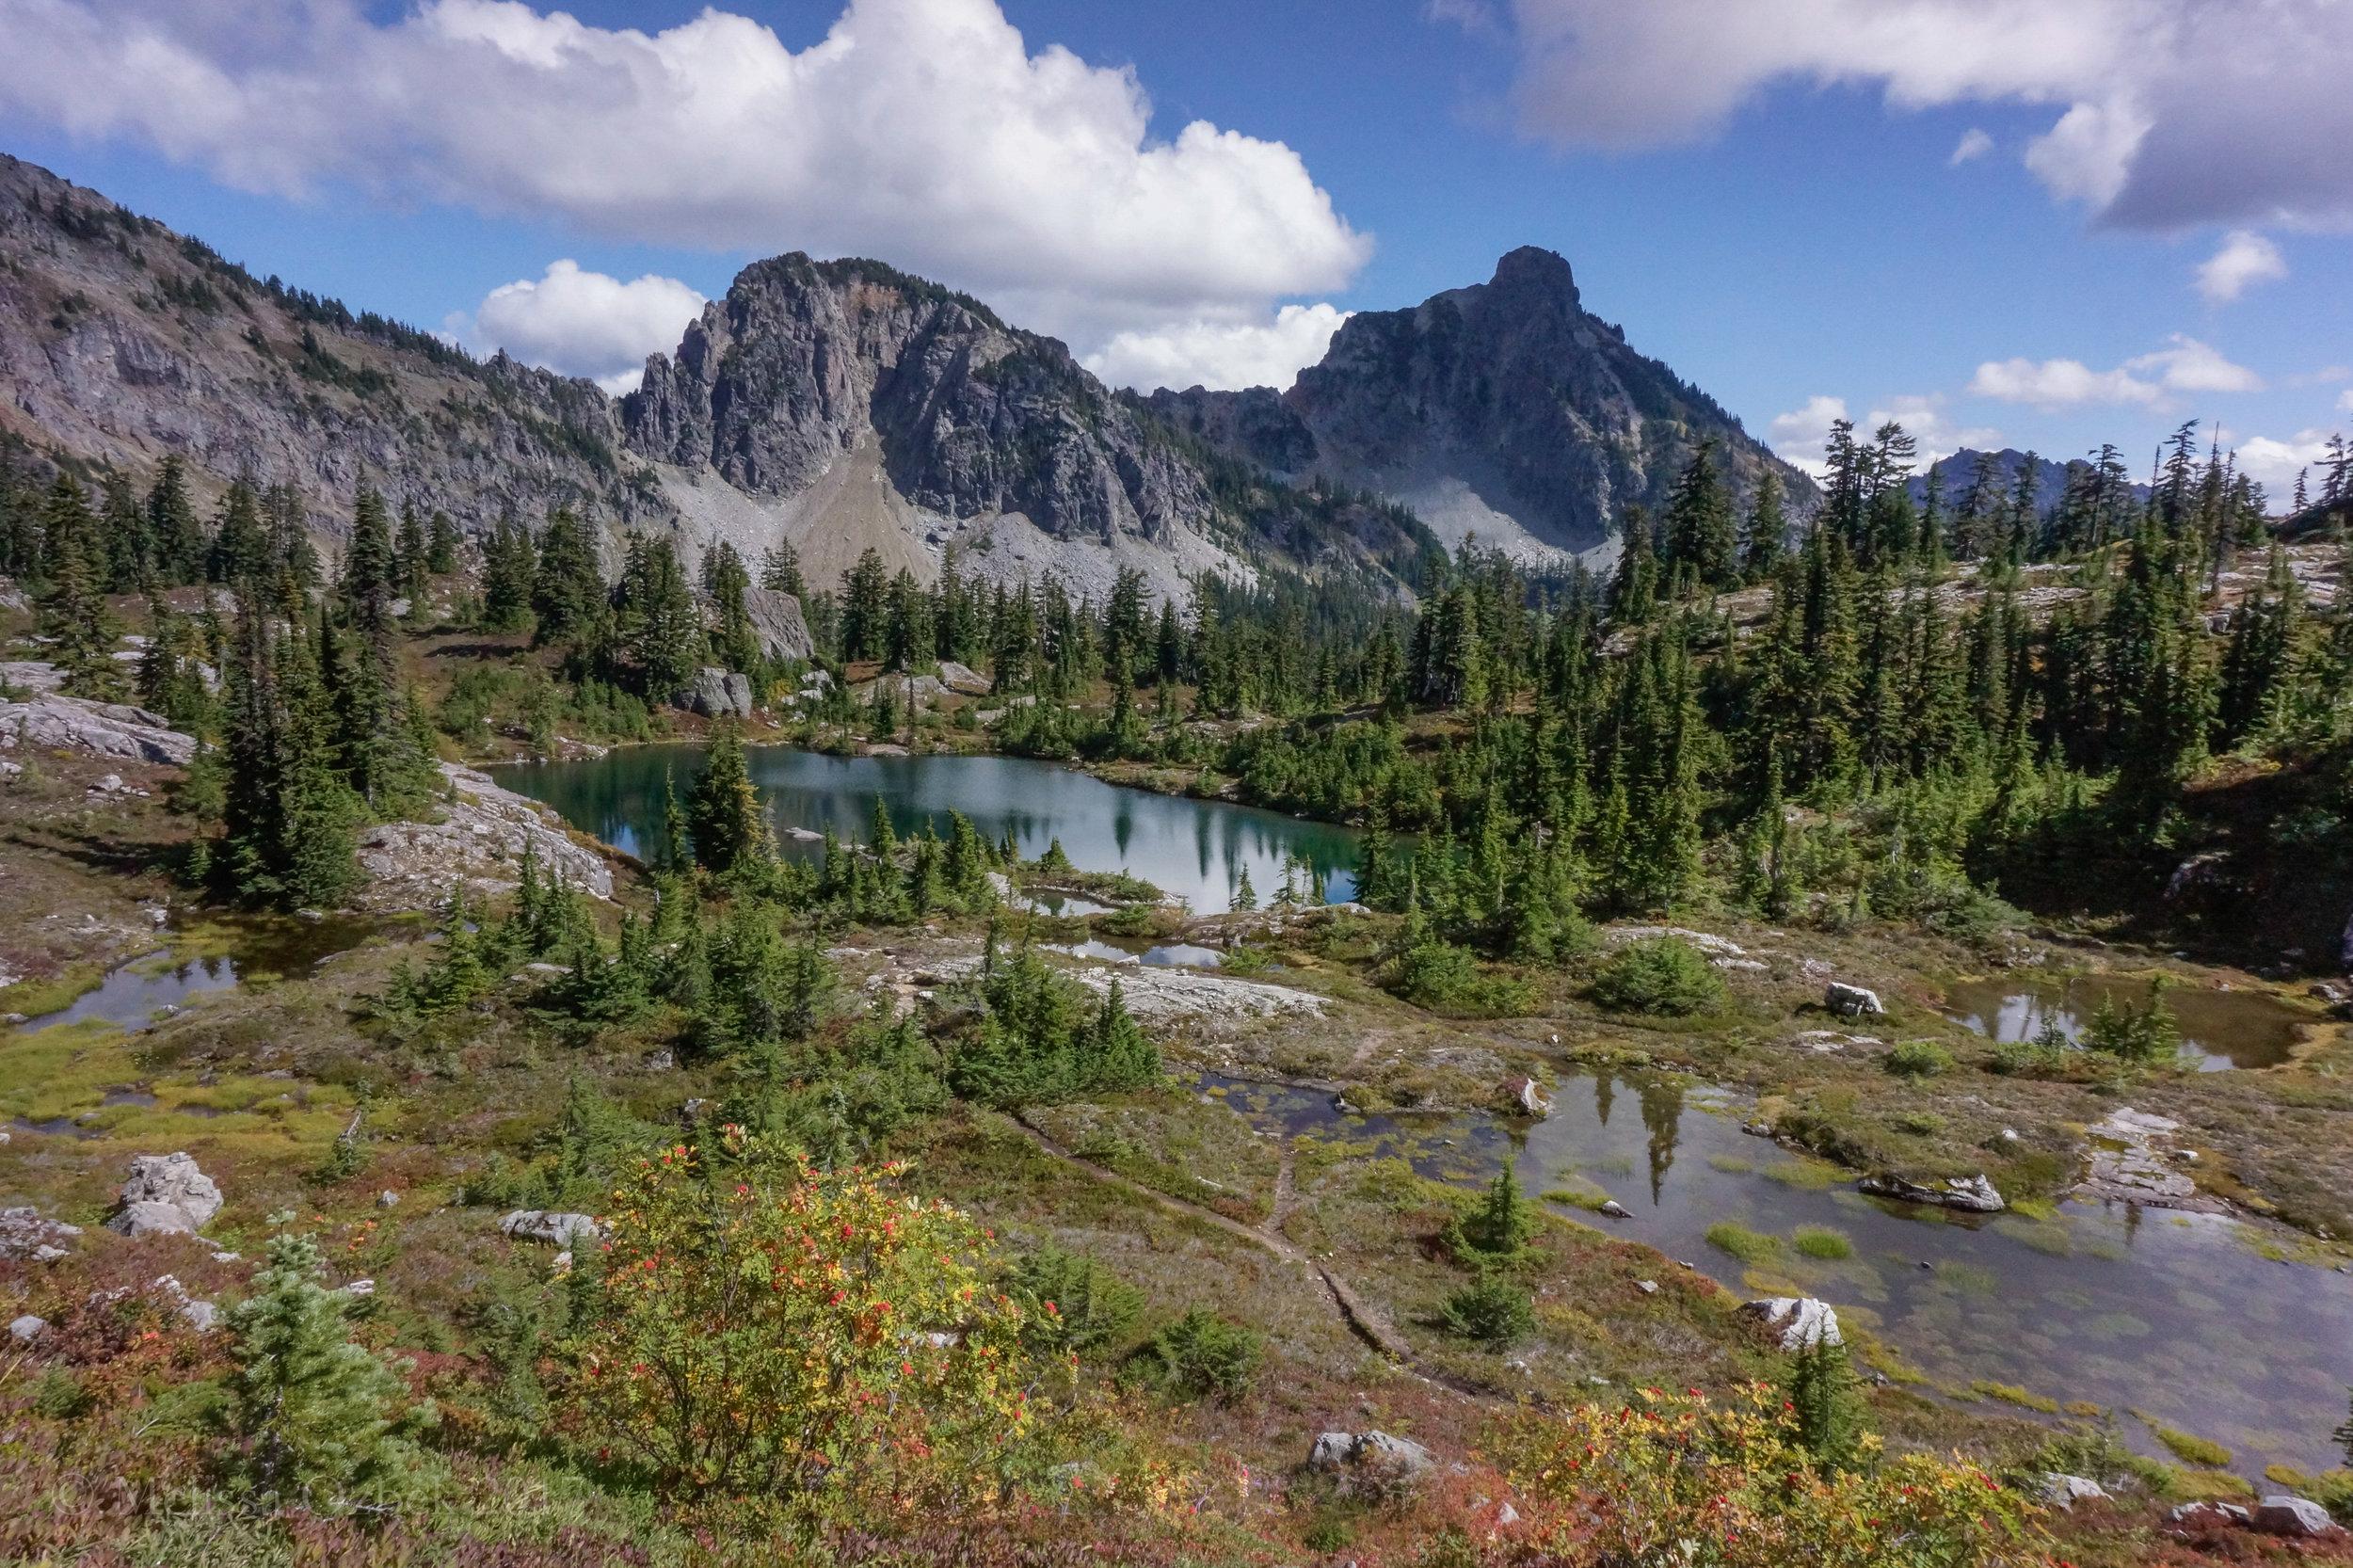 18. Lila Lake, an optional side trip from Rachel Lake